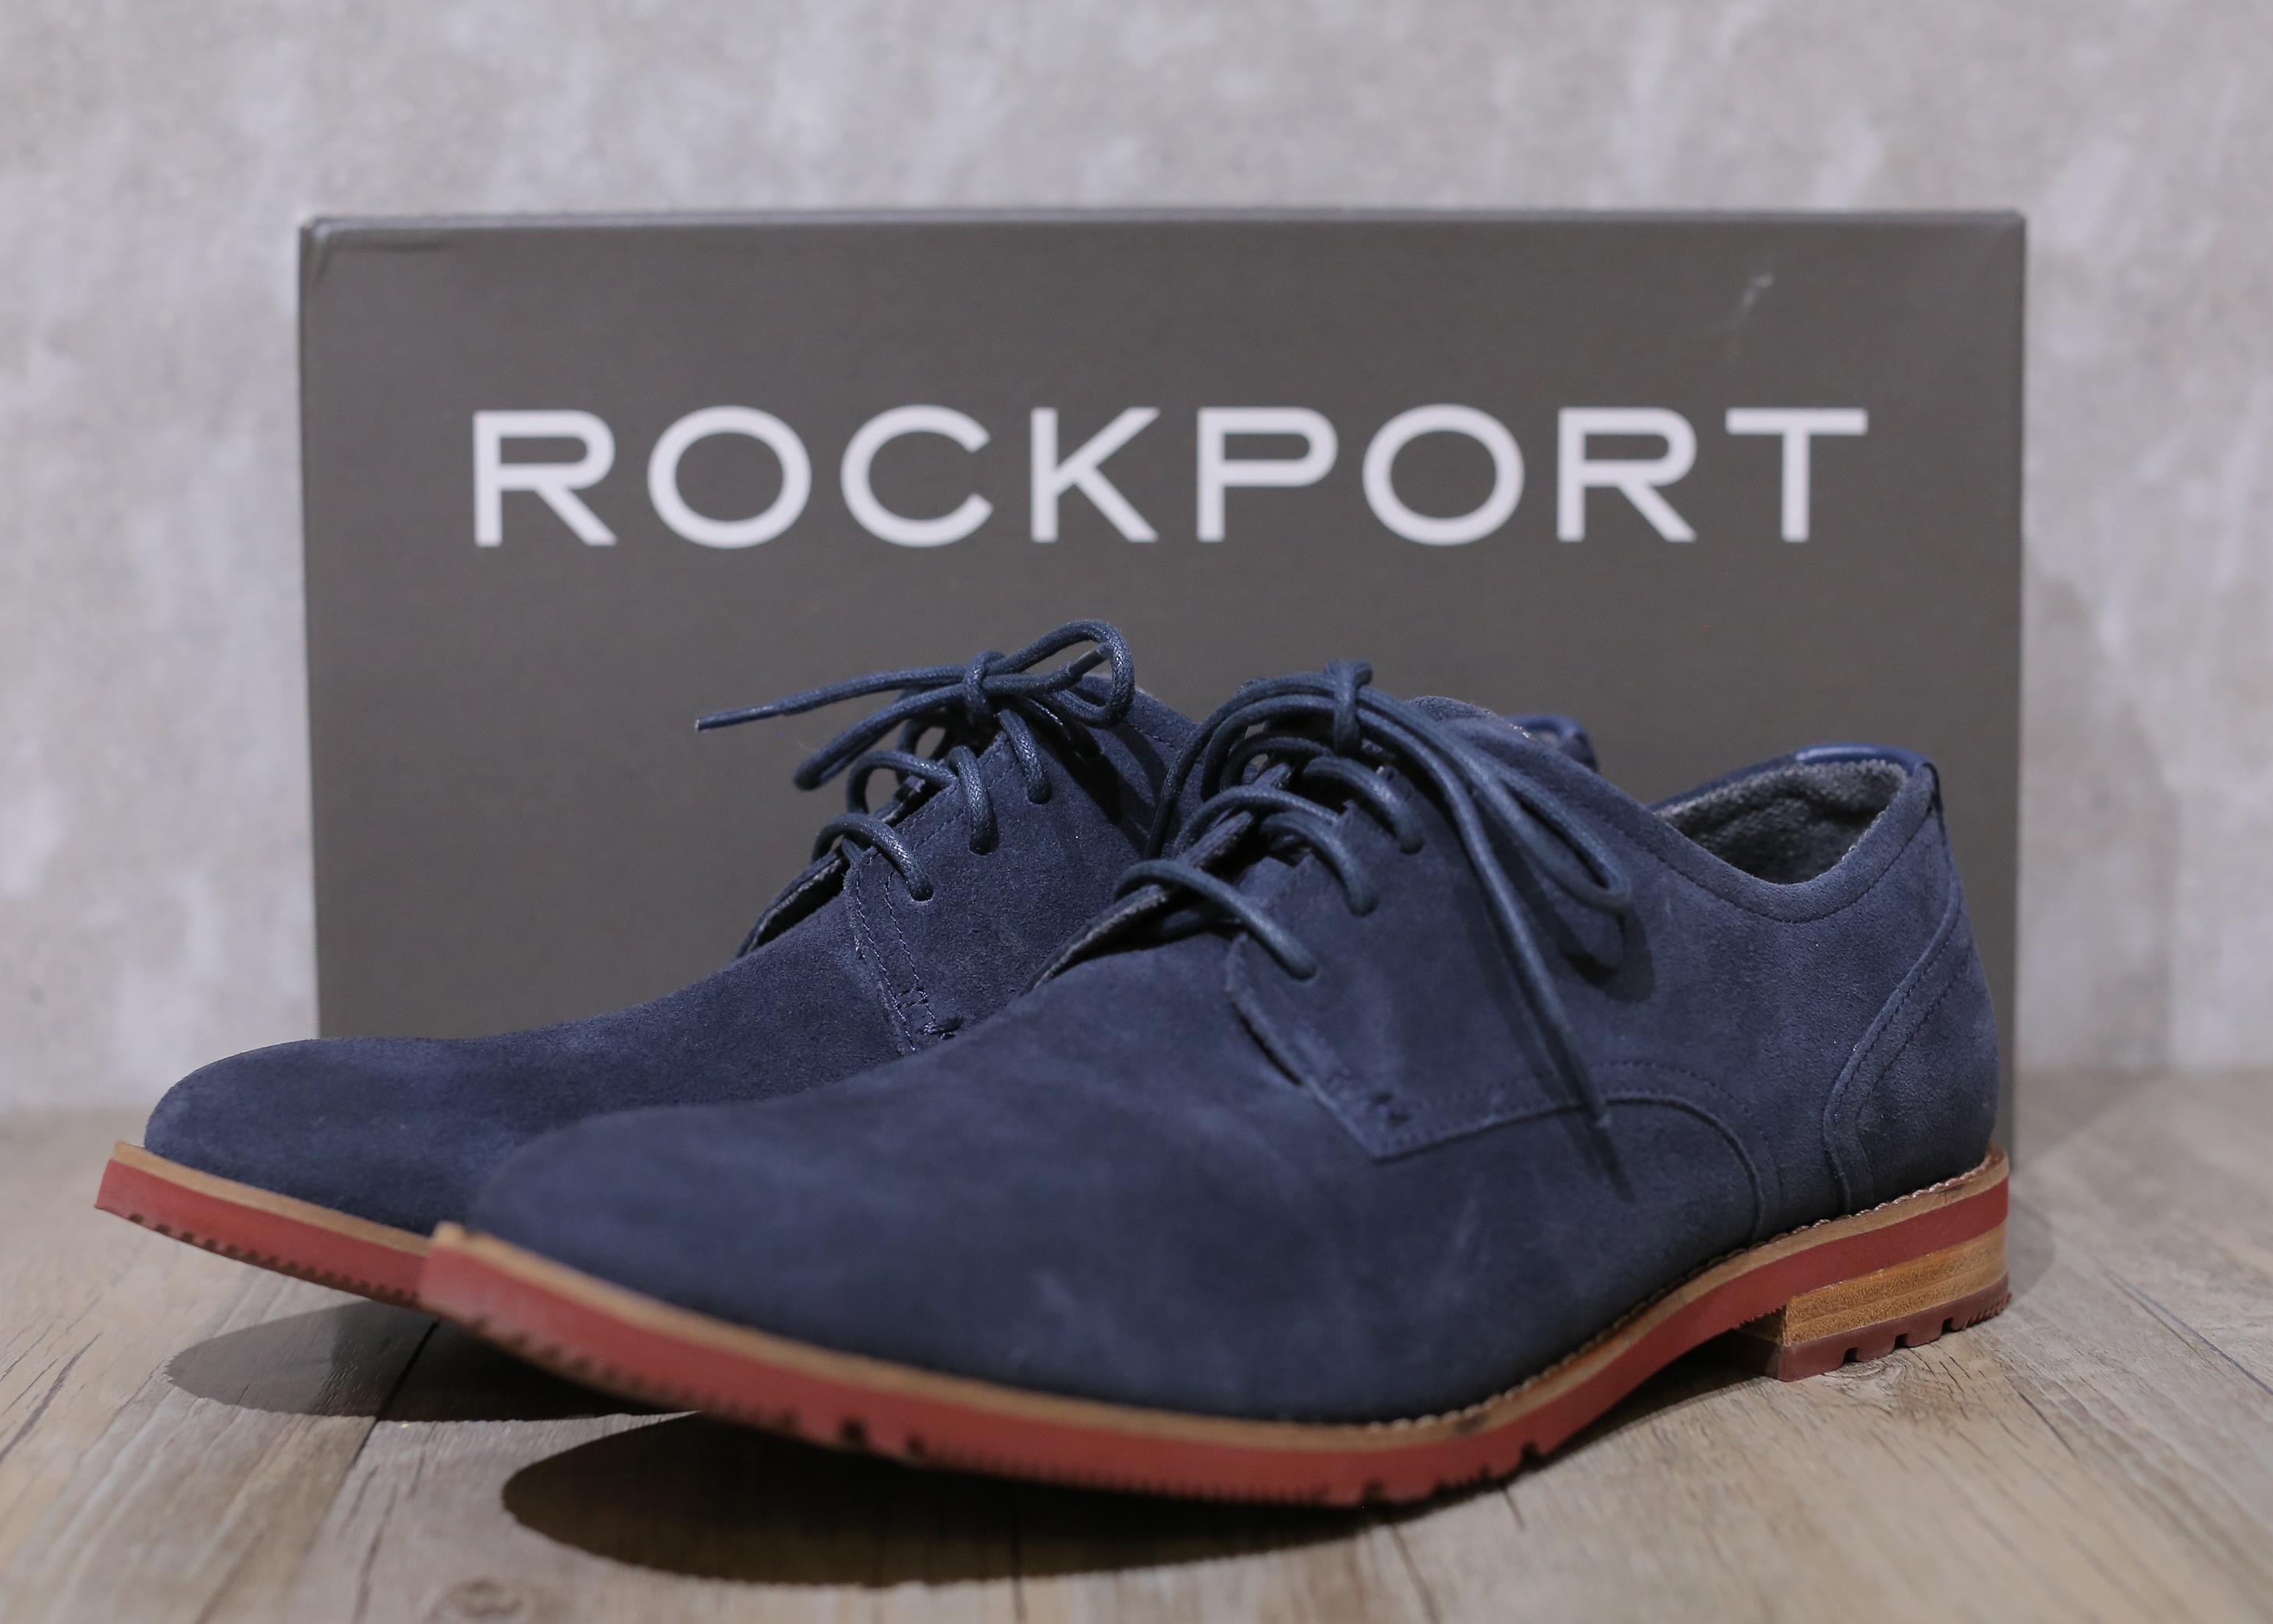 ROCKPORT (3).jpg.jpg